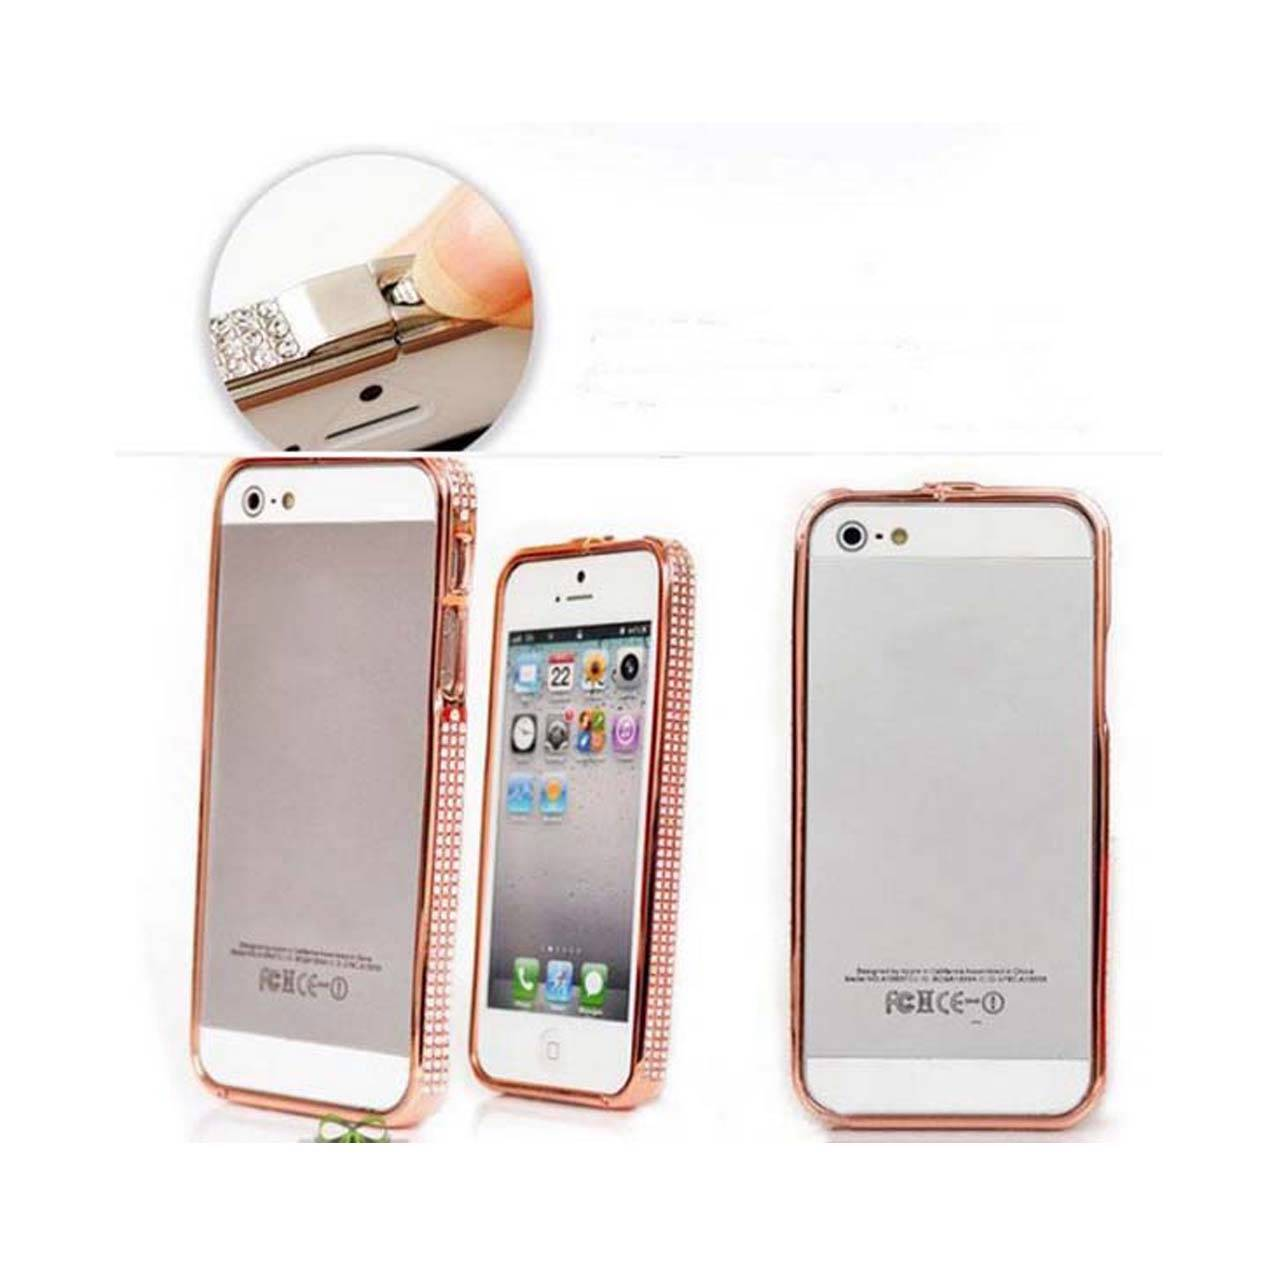 diamond deluxe metal aluminium rose gold case bumper for iphone 4 4s 5 5s ebay. Black Bedroom Furniture Sets. Home Design Ideas